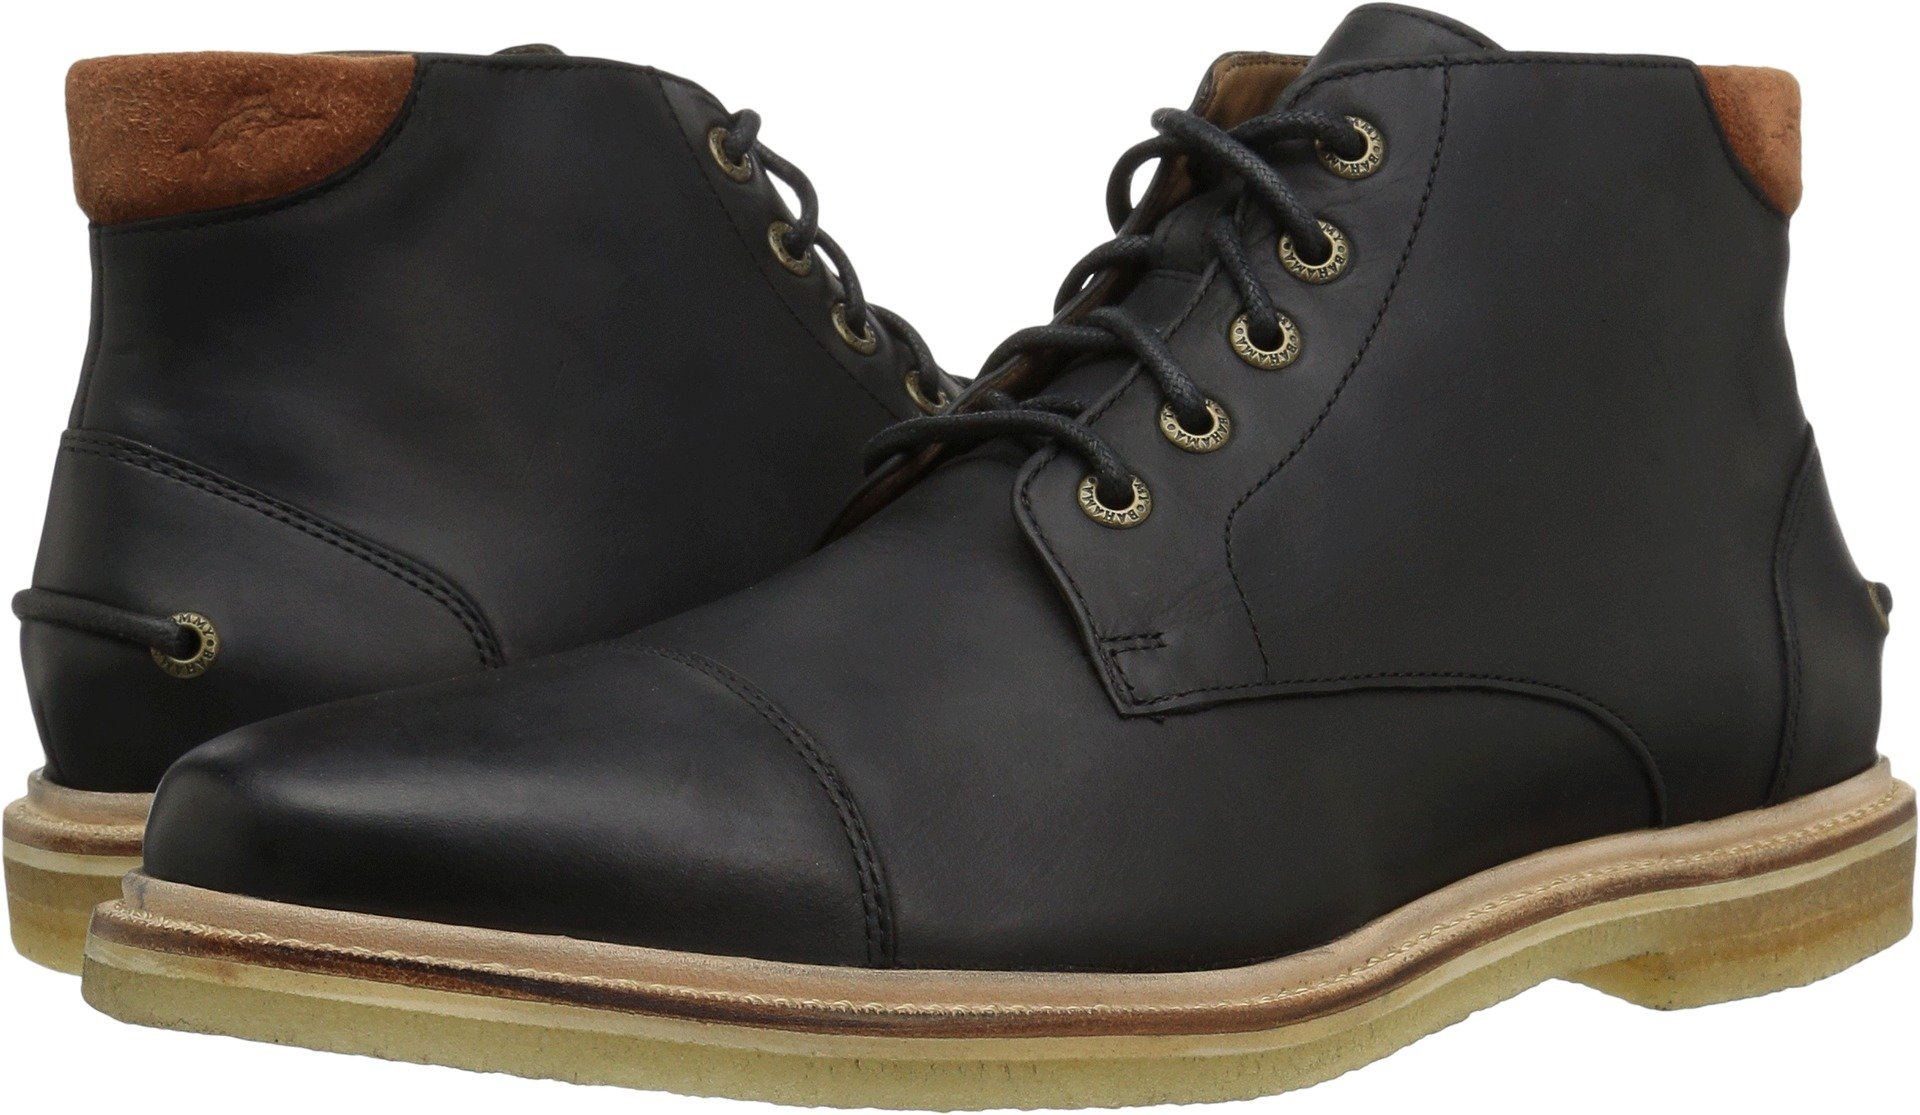 Tommy Bahama Men's Argon Blooms Chukka Boot, Black, 10 D US